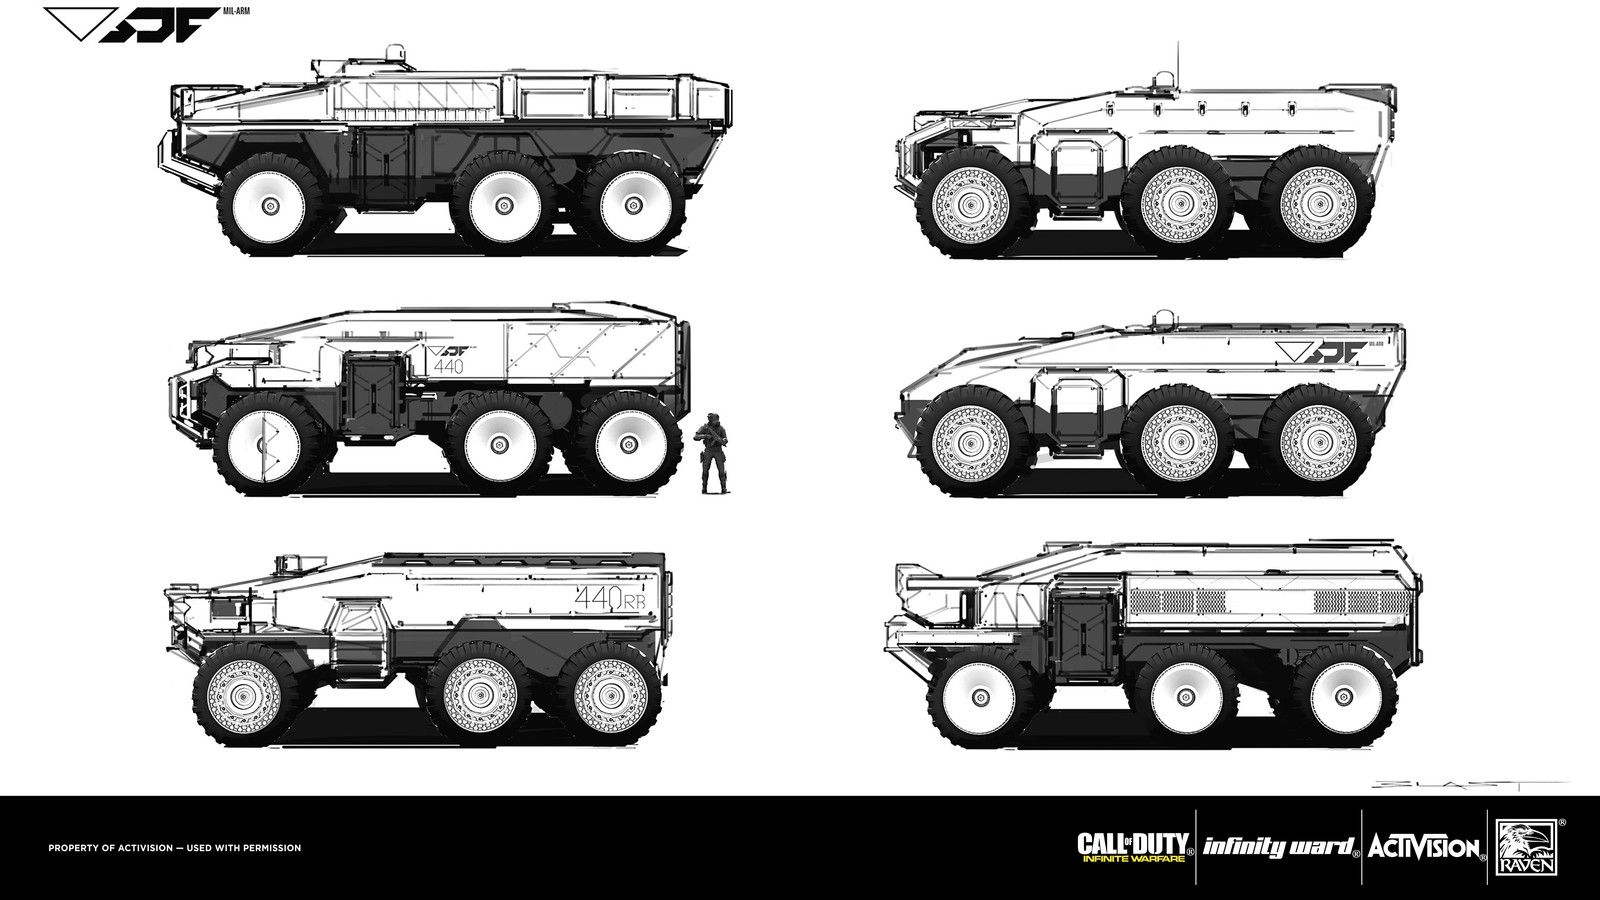 Call Of Duty: Infinite Warfare SDF APC Sketches, Benjamin Last on ArtStation at https://www.artstation.com/artwork/21rkg